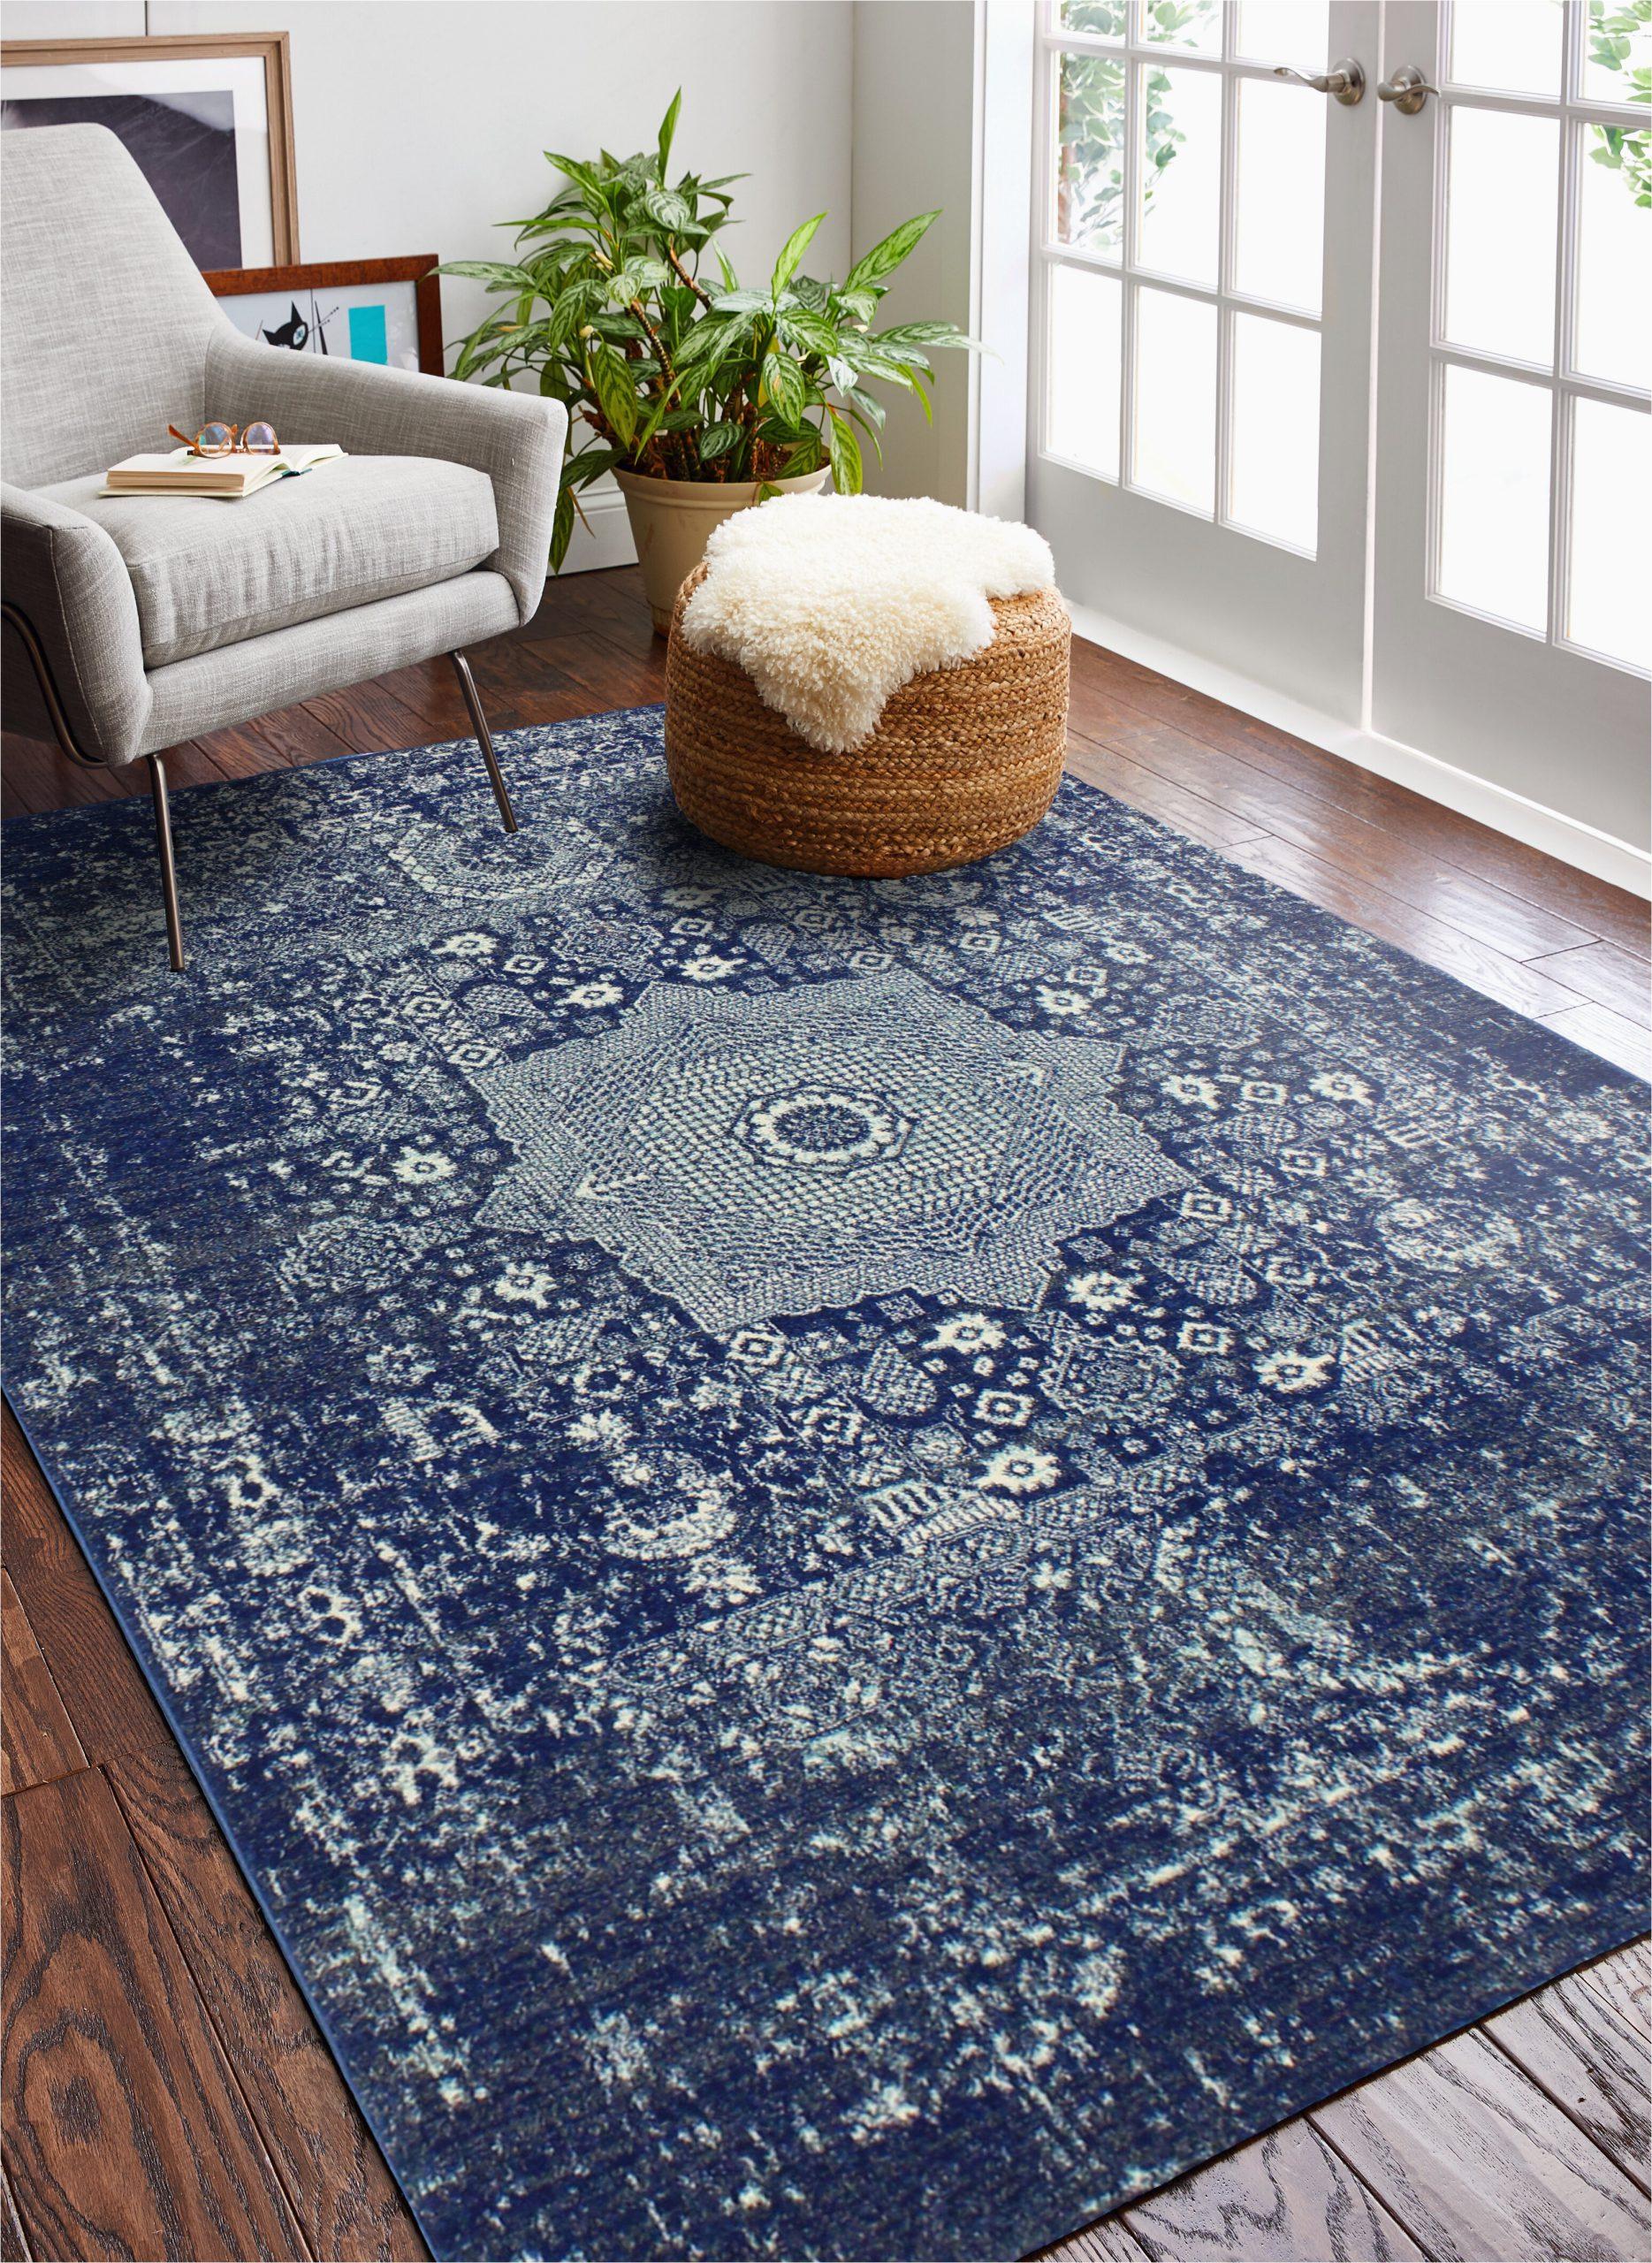 riggs distressed dark blue area rug mtna4220 piid=0